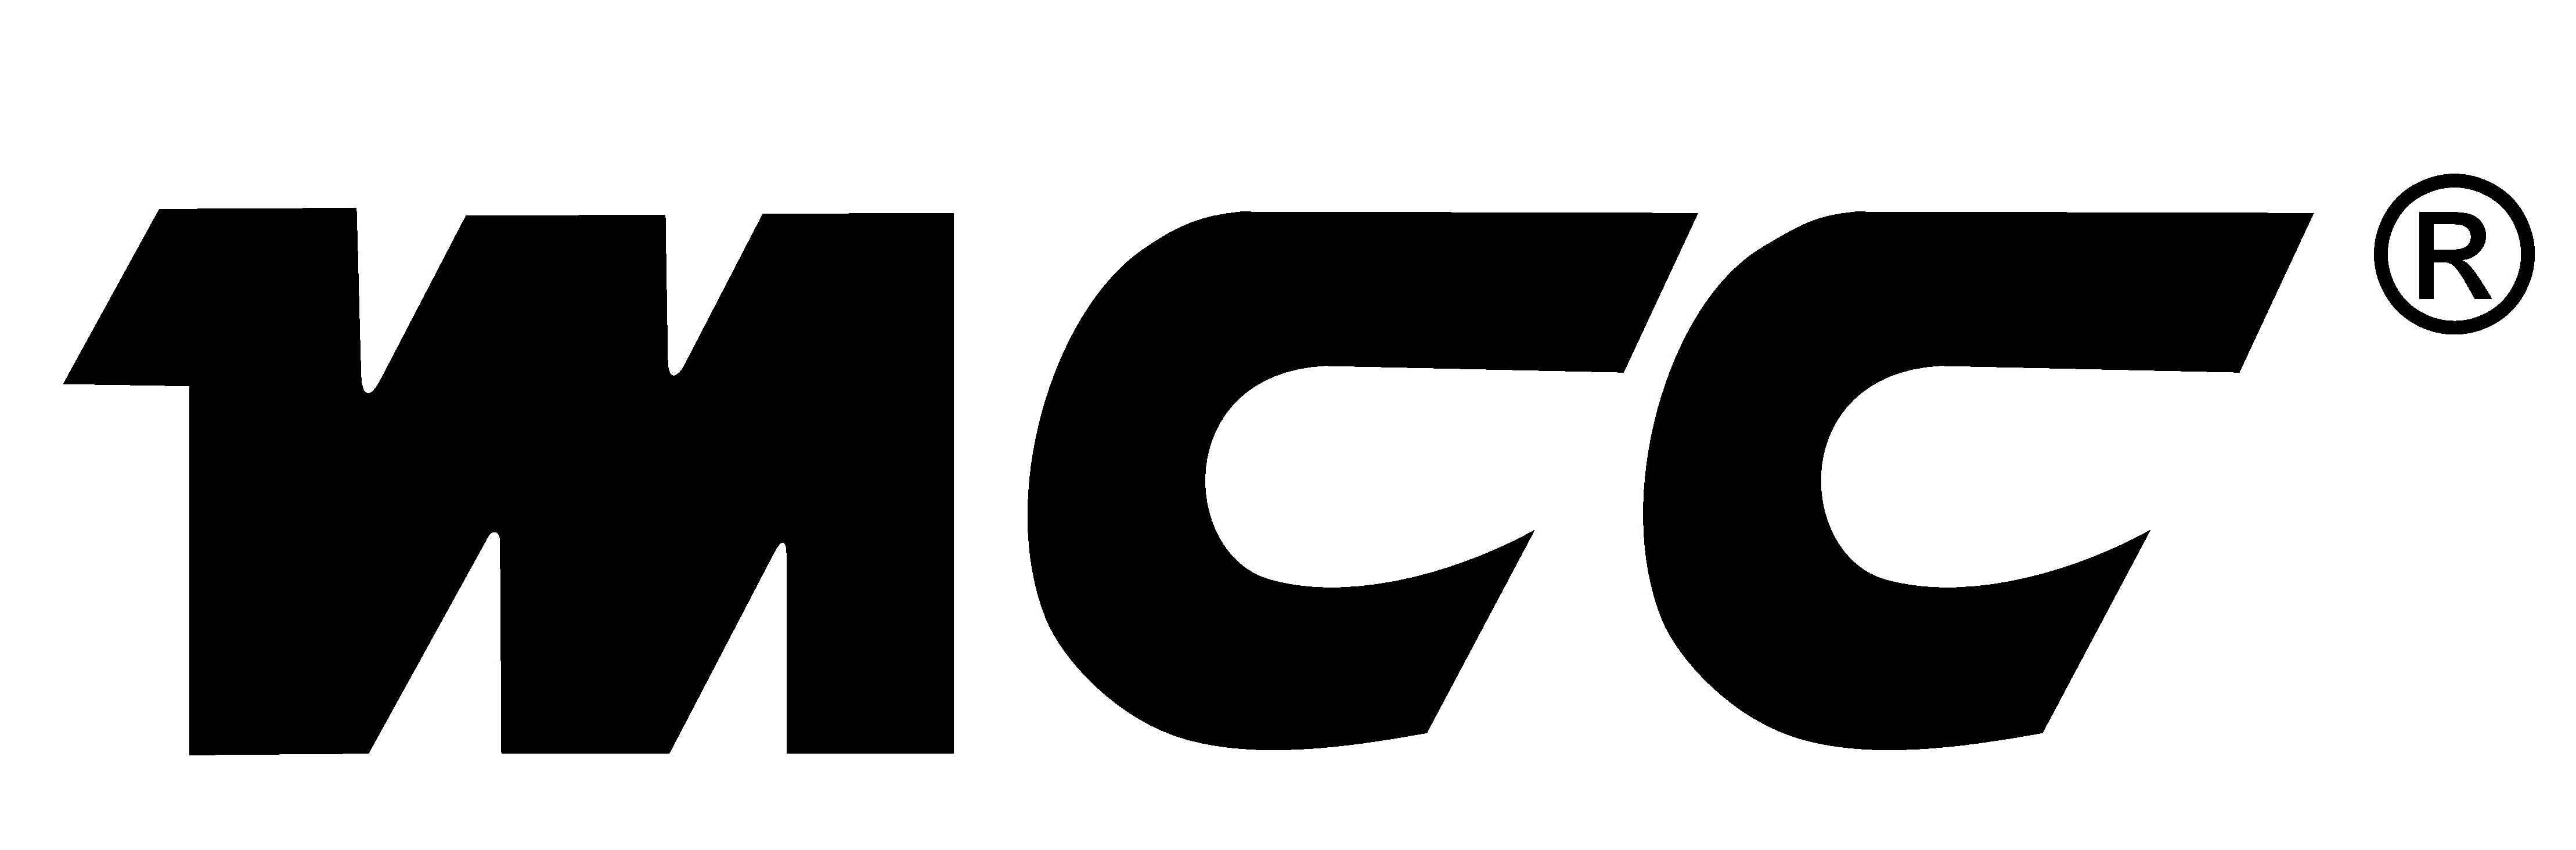 mcc transport logo - photo #23